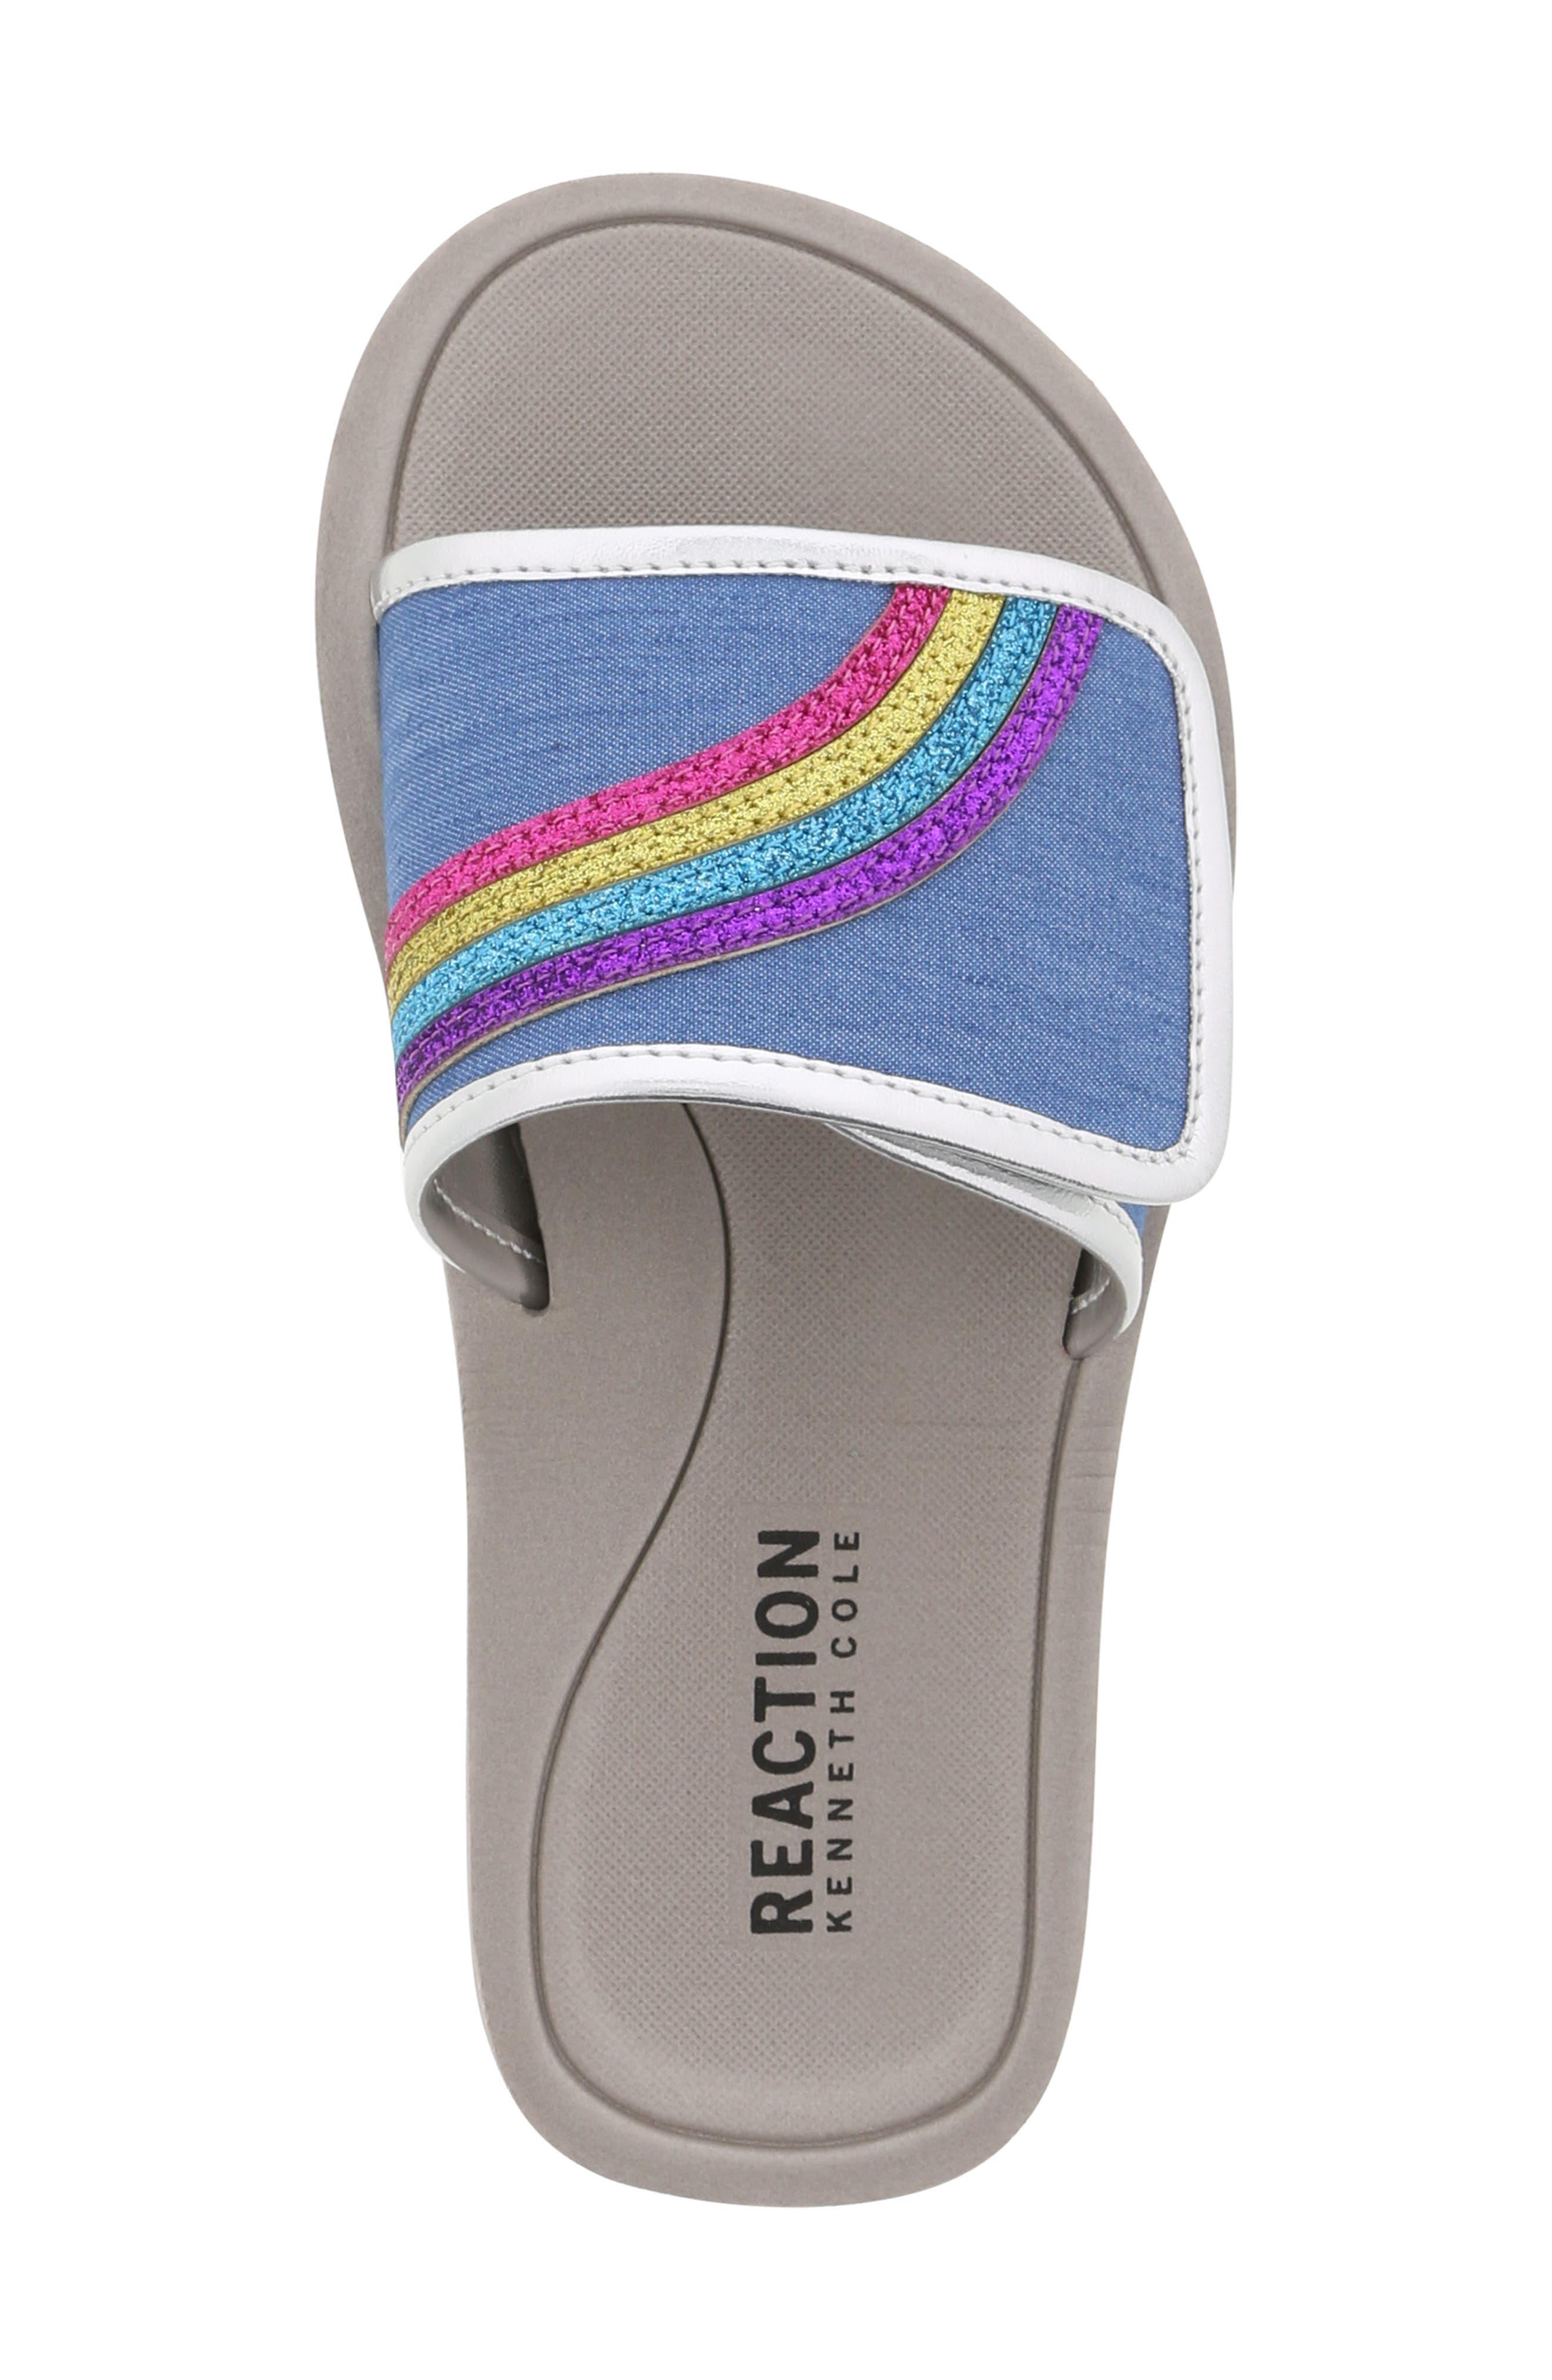 REACTION KENNETH COLE, Elise Karla Rainbow Slide Sandal, Alternate thumbnail 5, color, DENIM